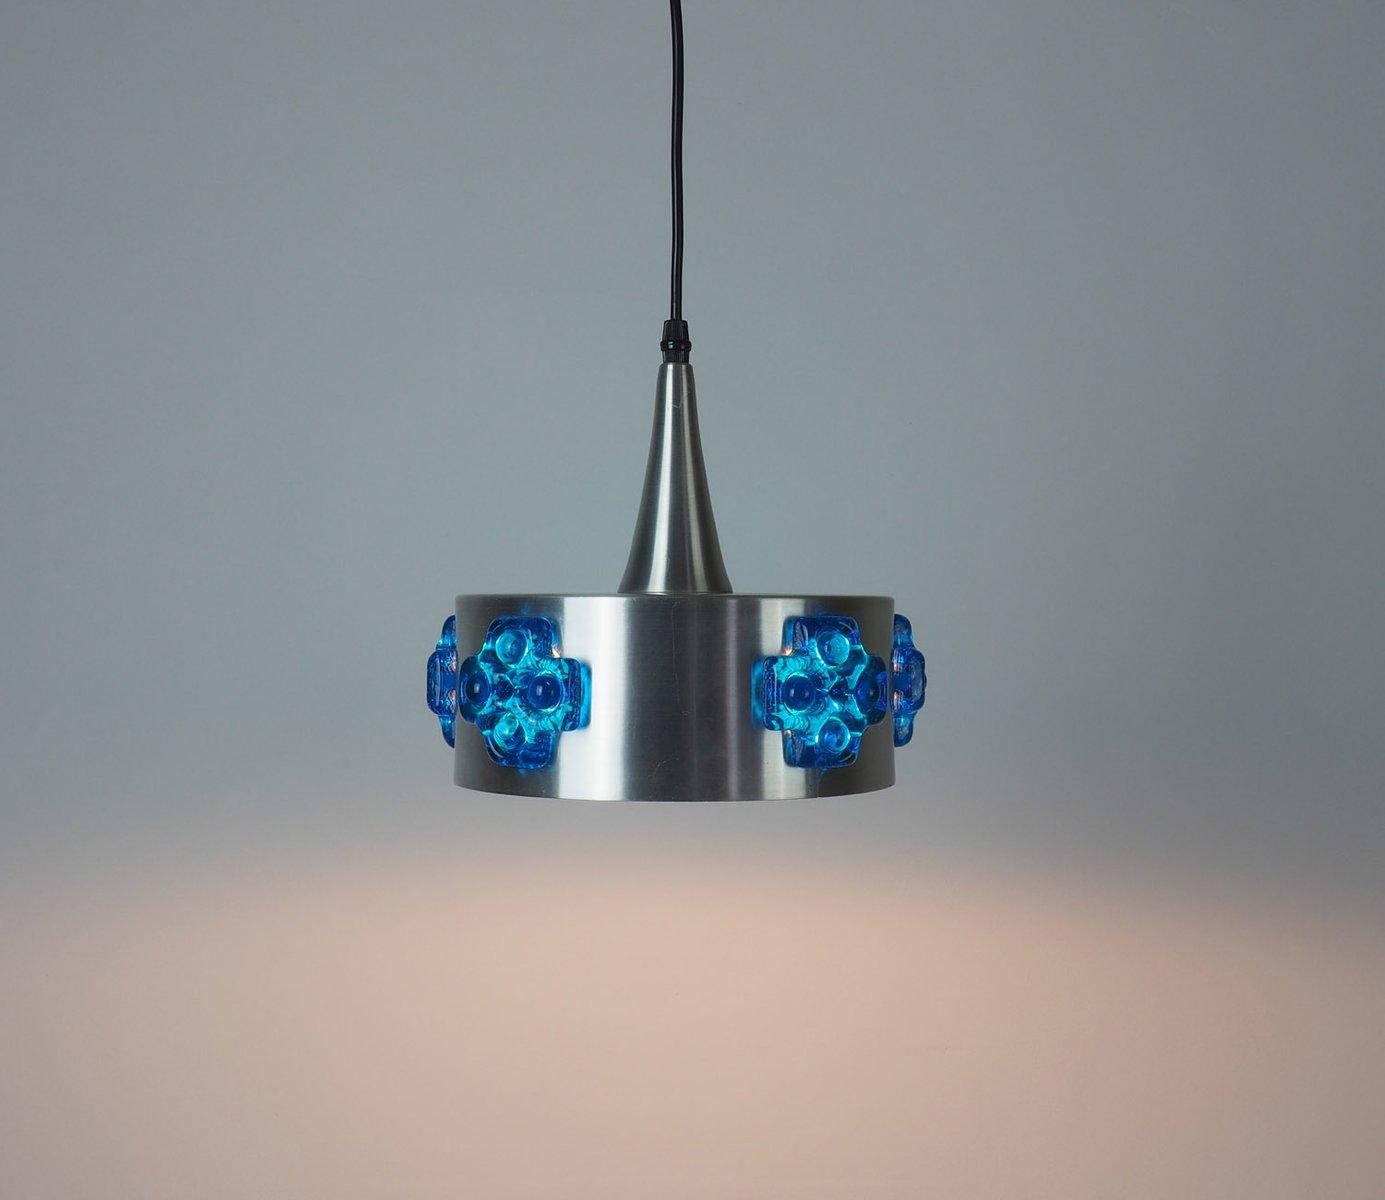 Vintage Hängelampe aus gebürstetem Aluminium & blauem Kristallglas, 19...